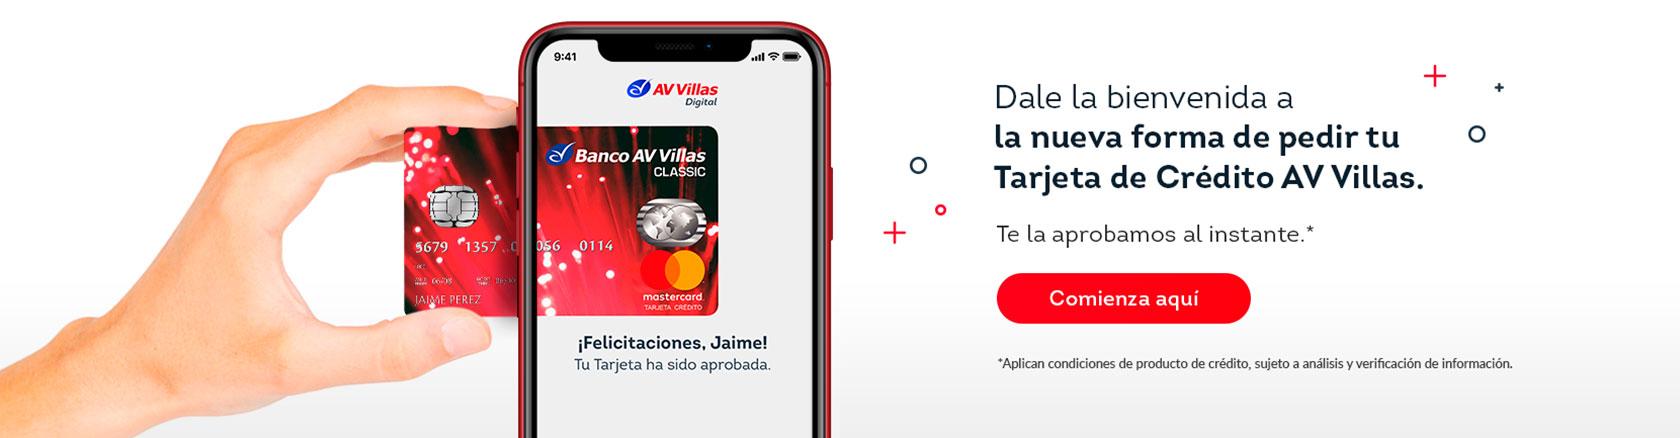 Banco AV Villas - Banca Personal